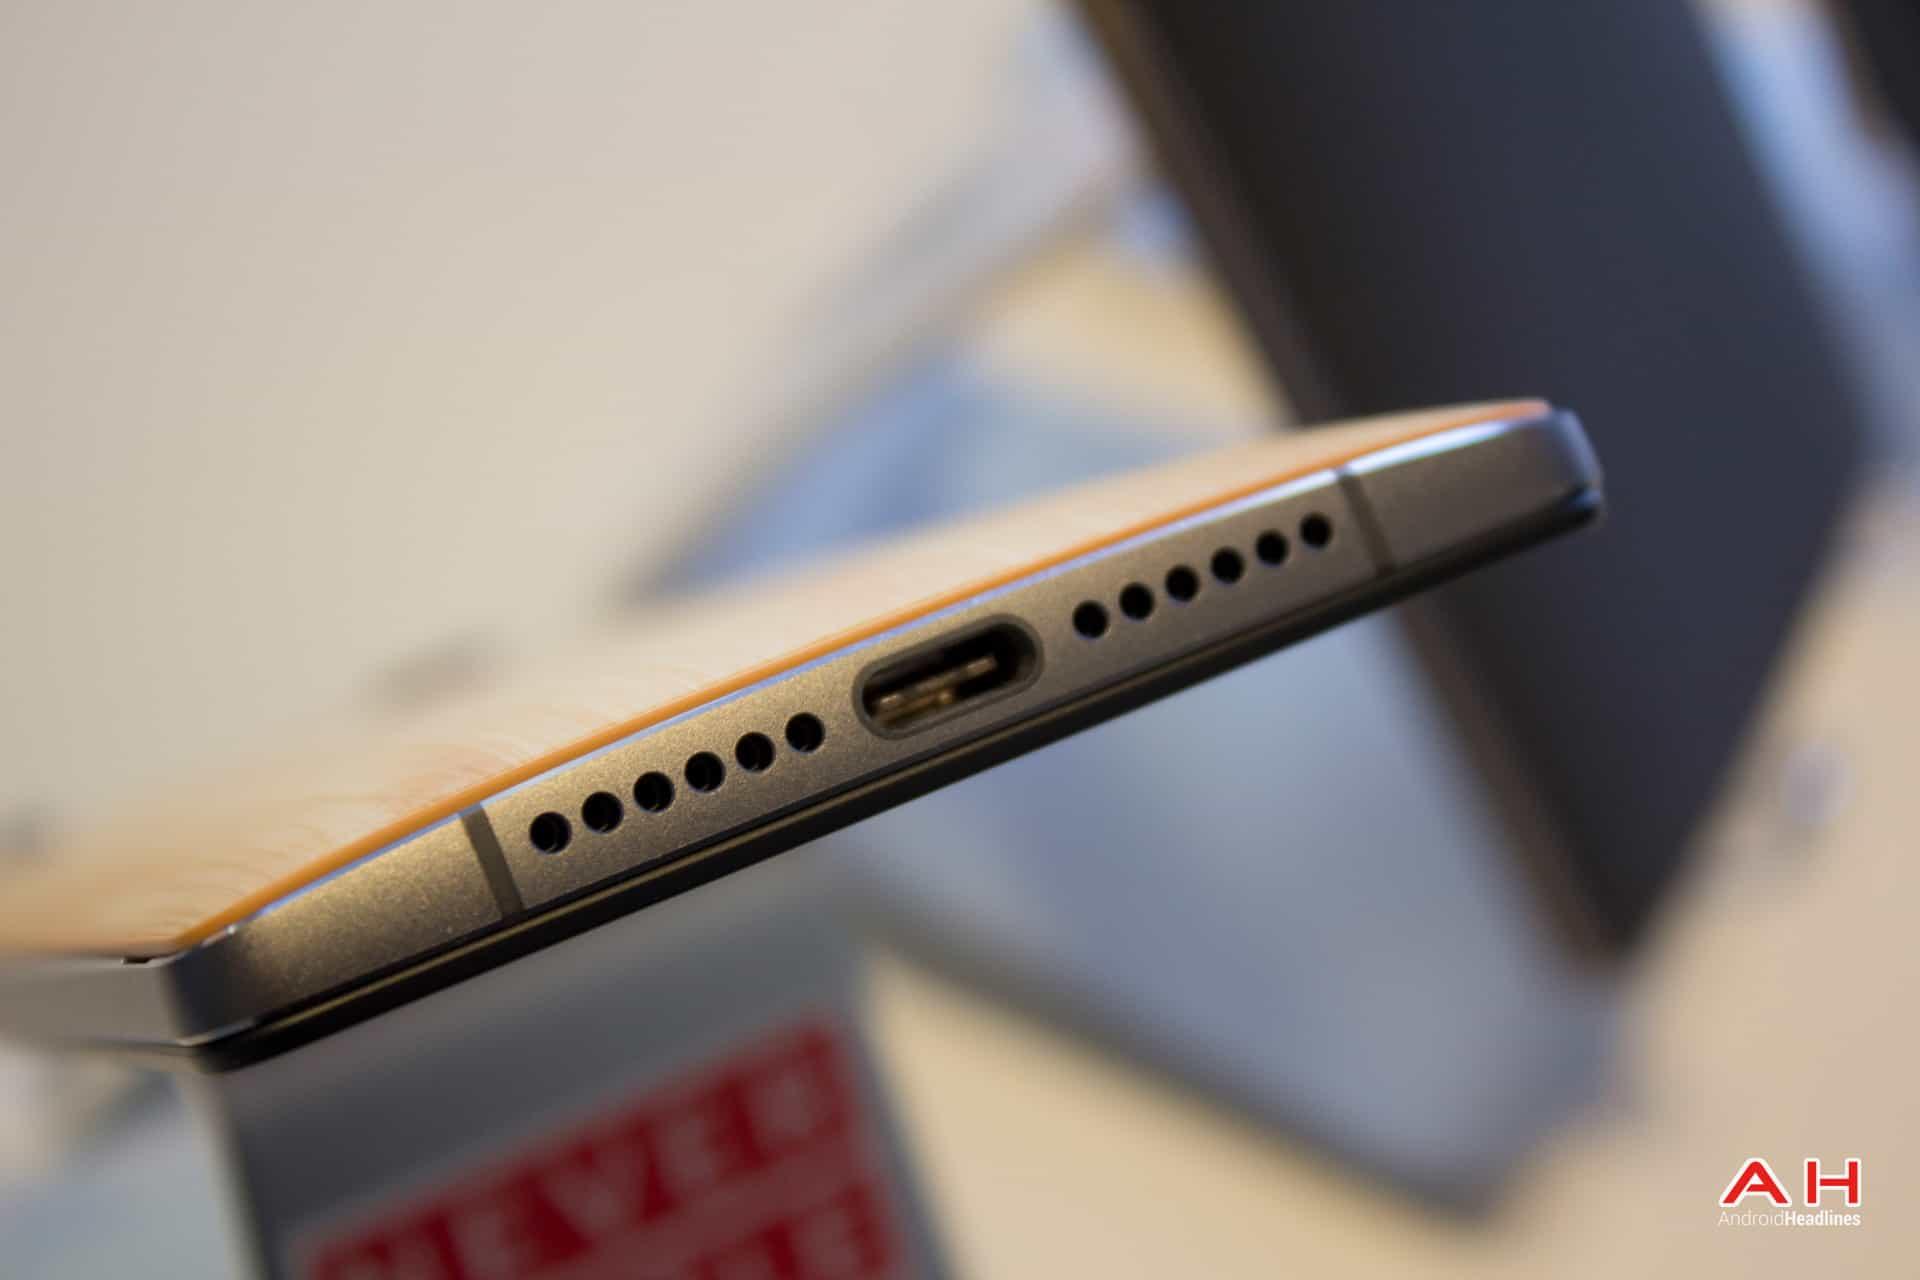 AH OnePlus 2 61